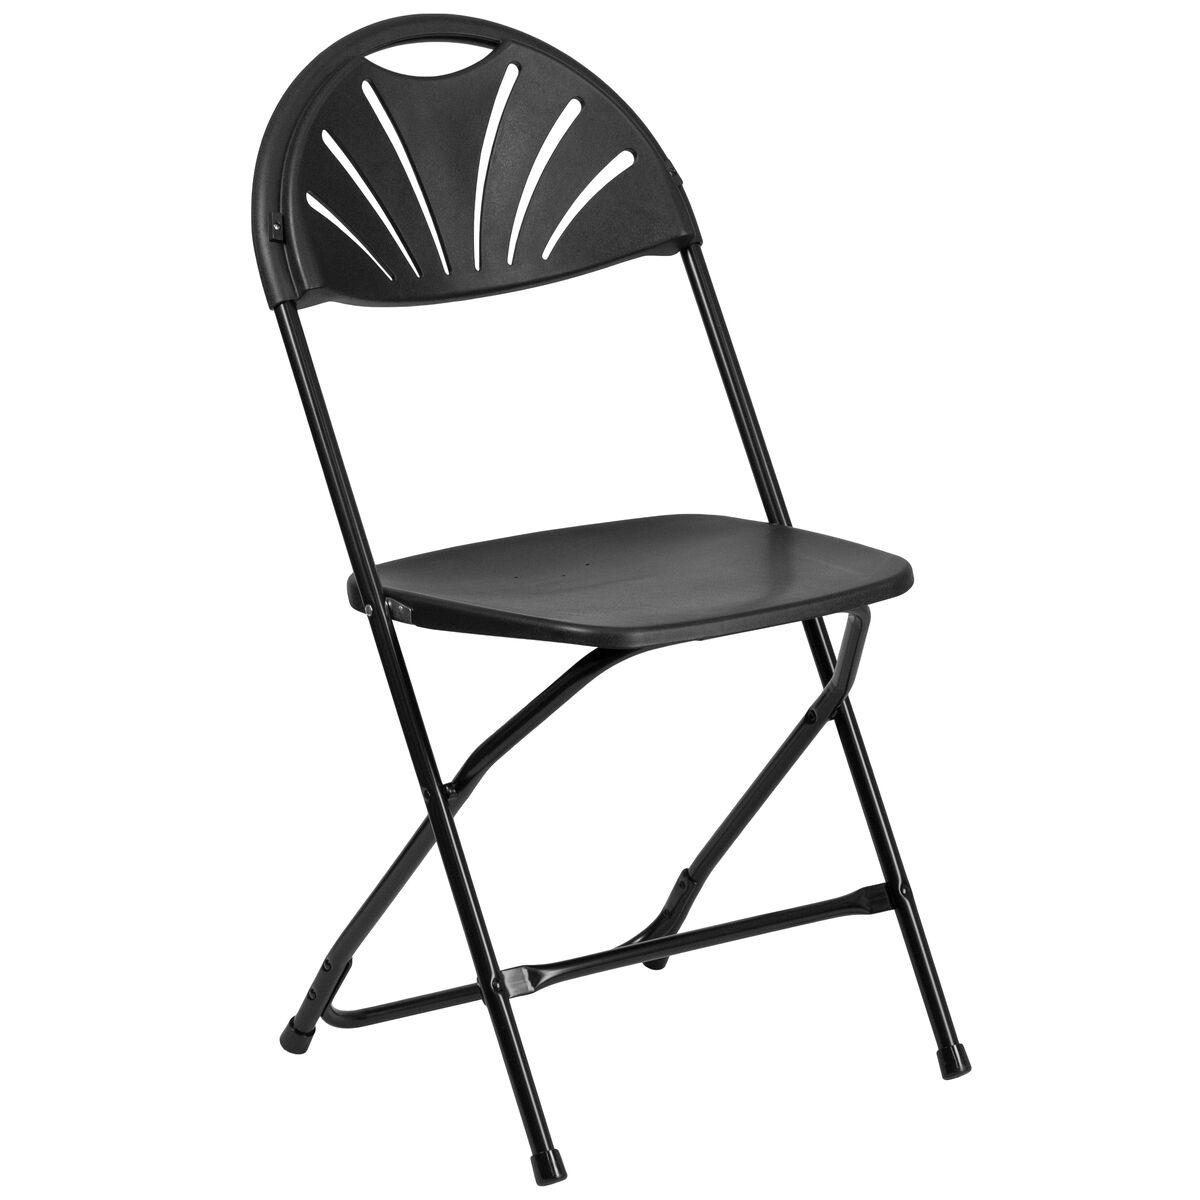 Funiture For Less: Flash Furniture LE-L-4-BK-GG